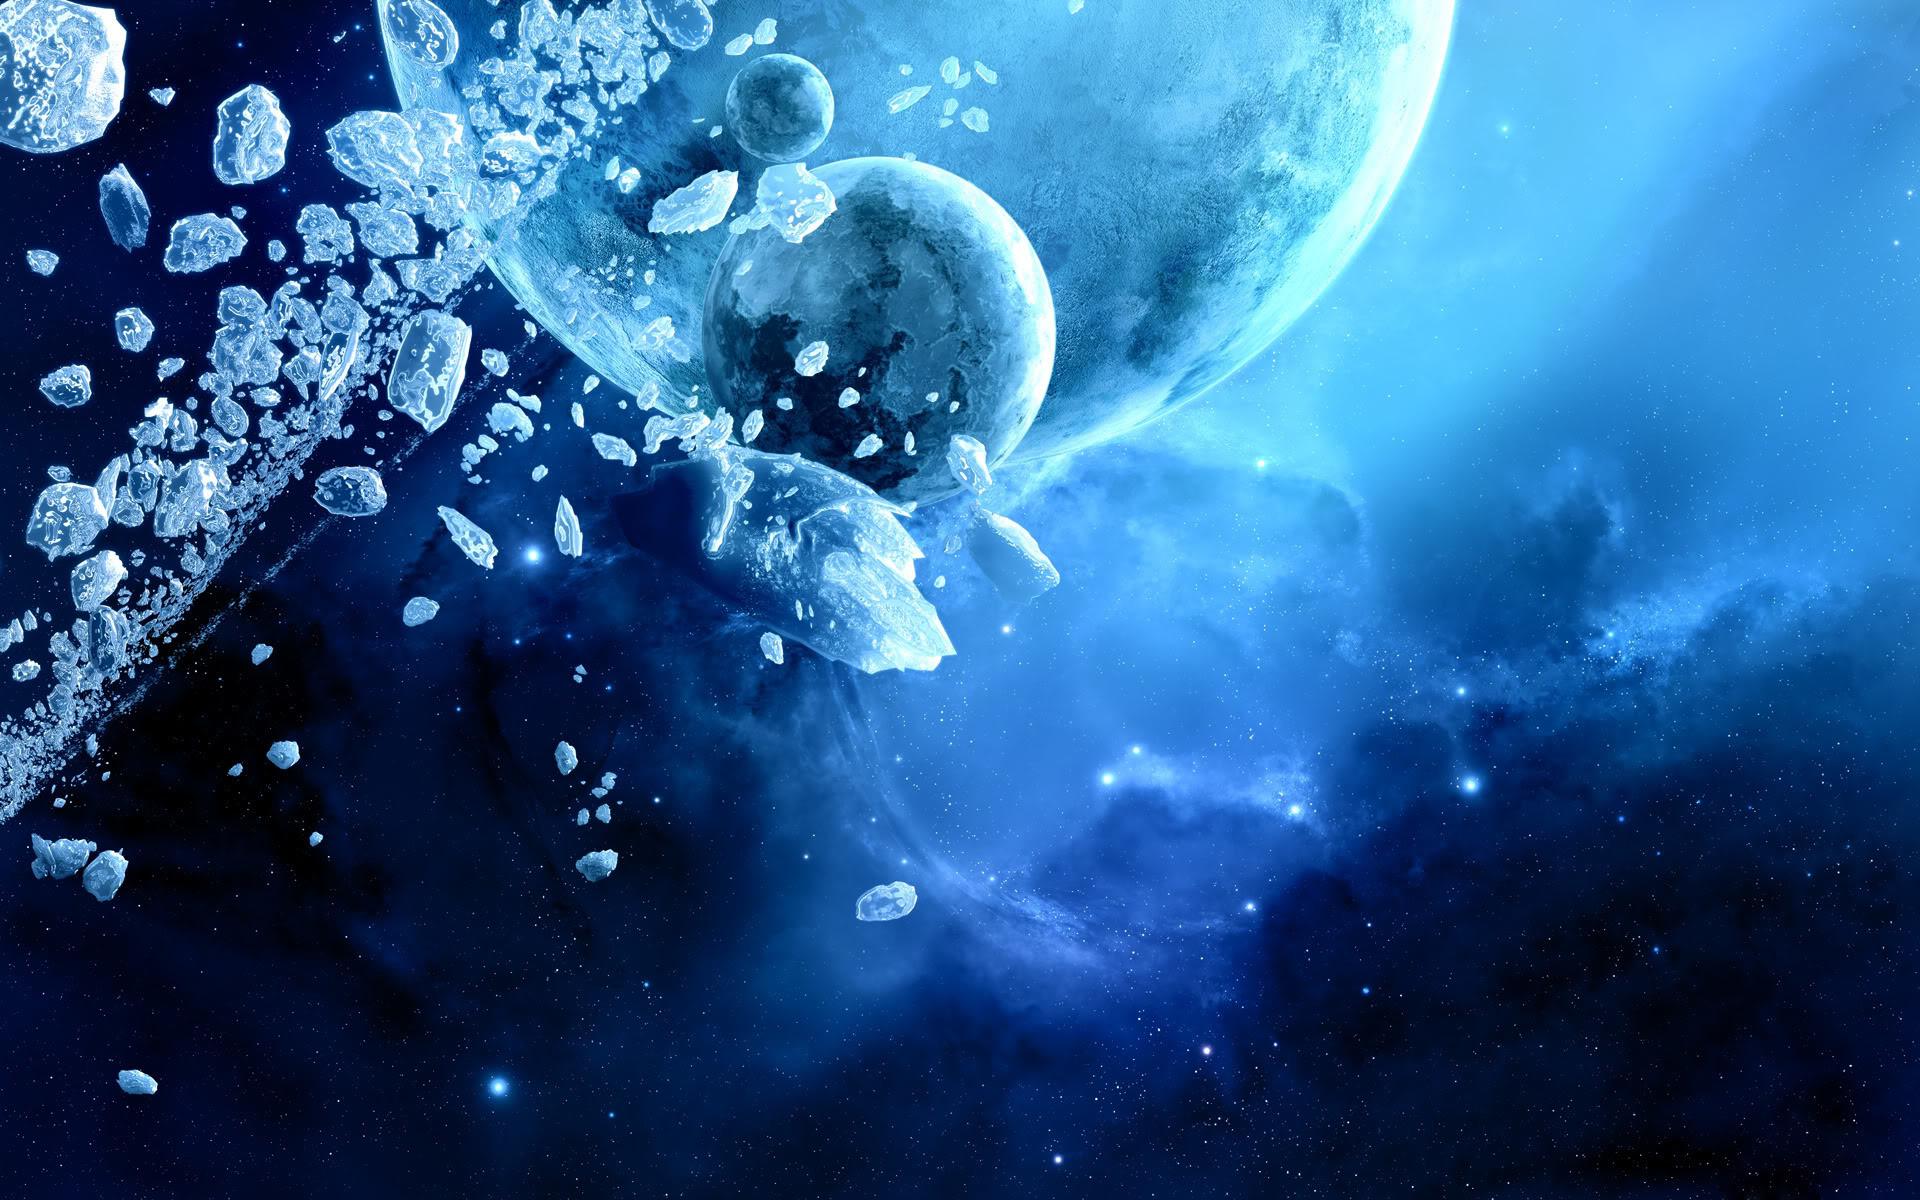 quality Glacialis HD Science Fiction (Sci-fi) wallpaper / .